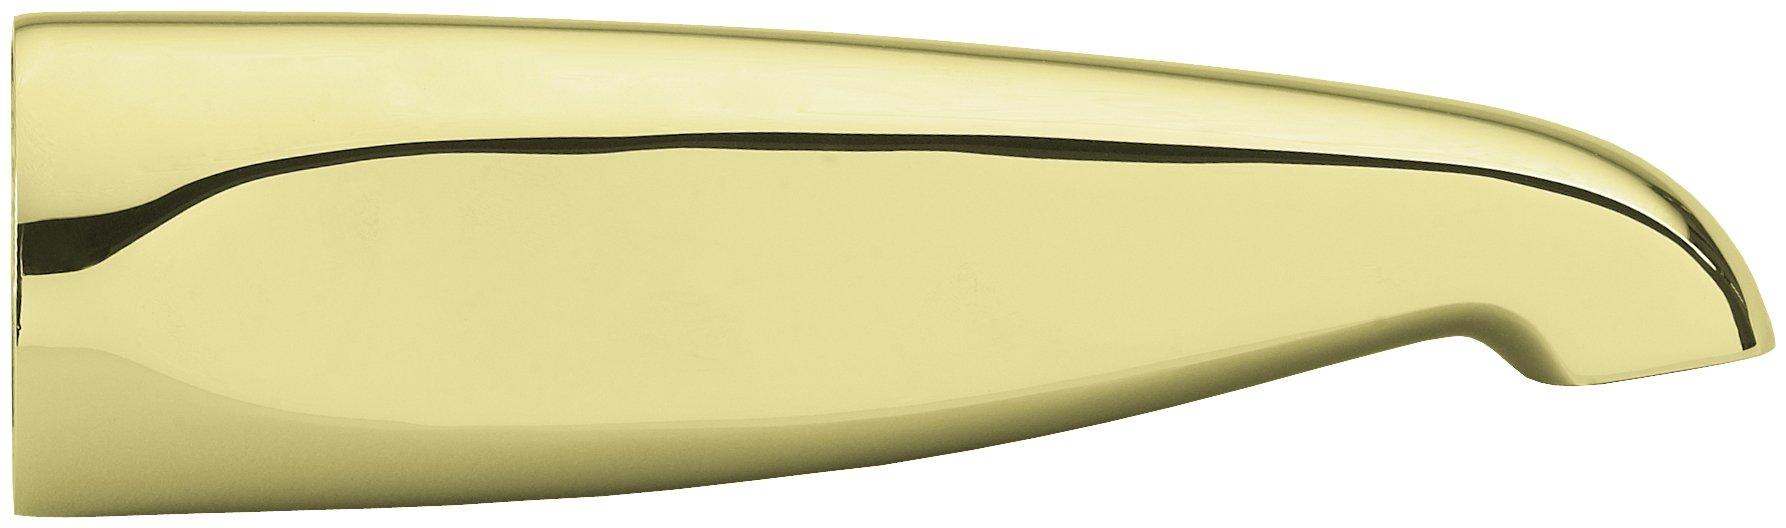 Westbrass D3102-03 Tub Spout 7-1/4'', Polished Brass